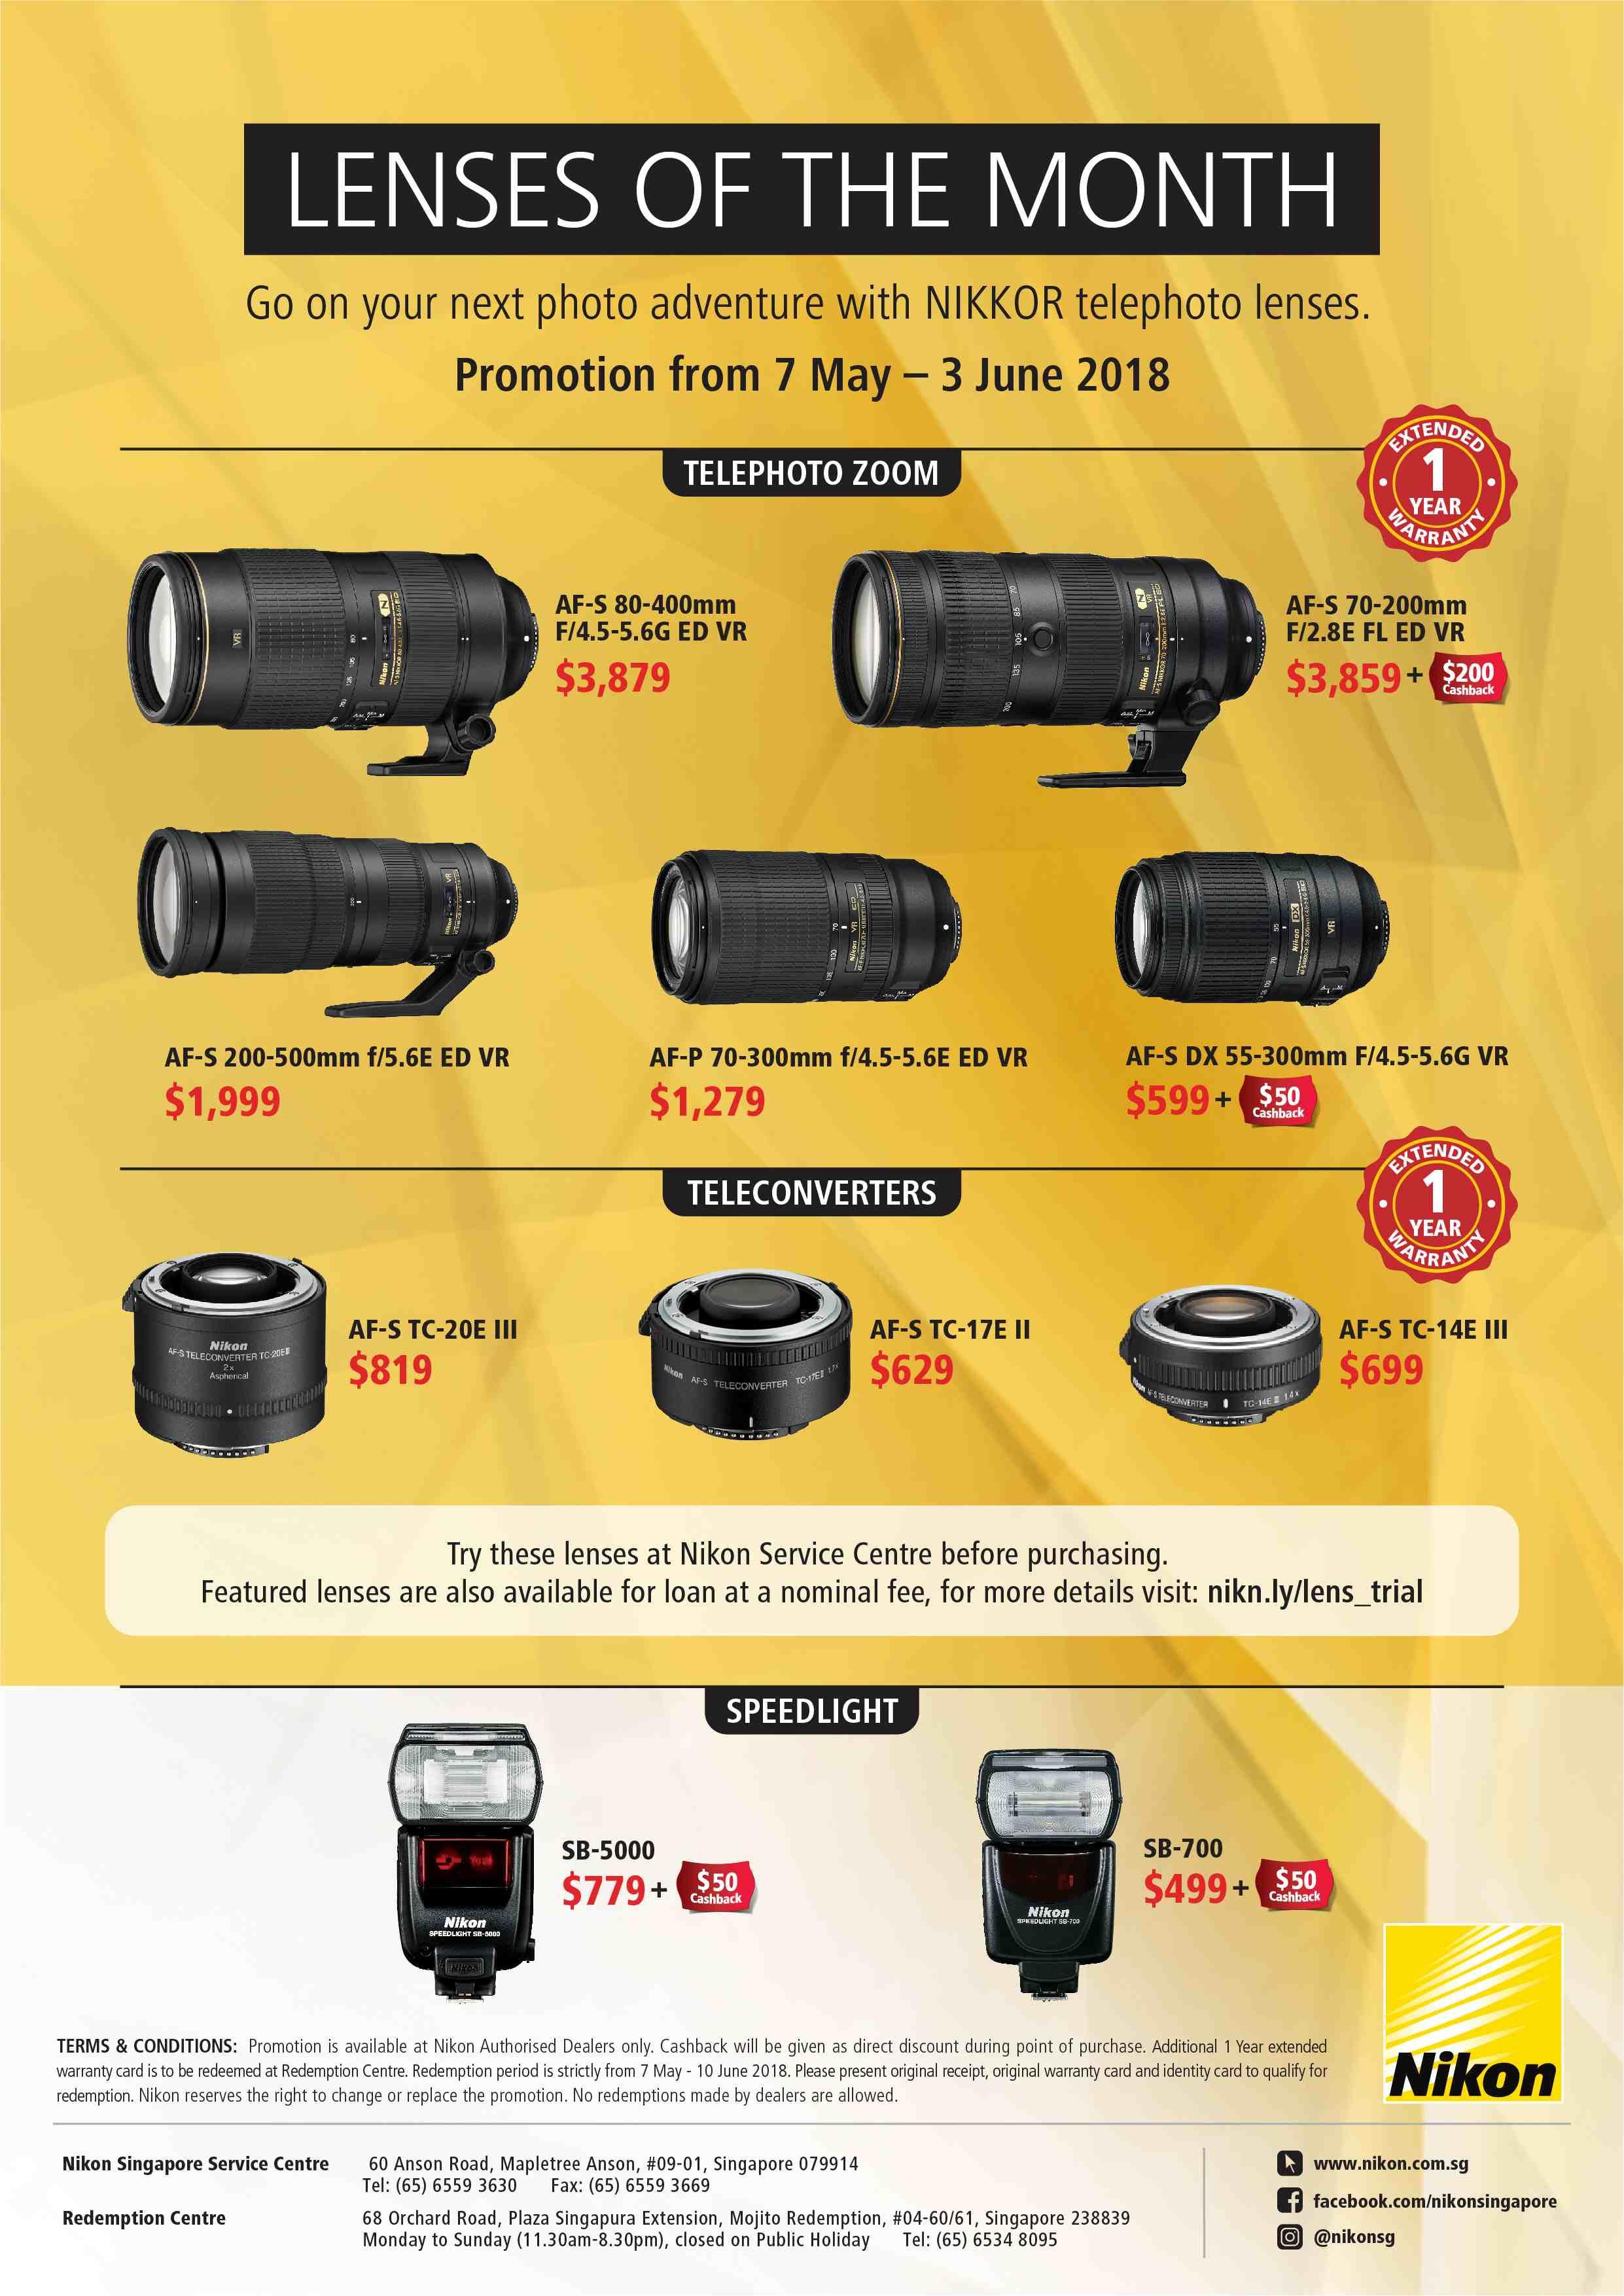 nikon-may-promotion-lenses_